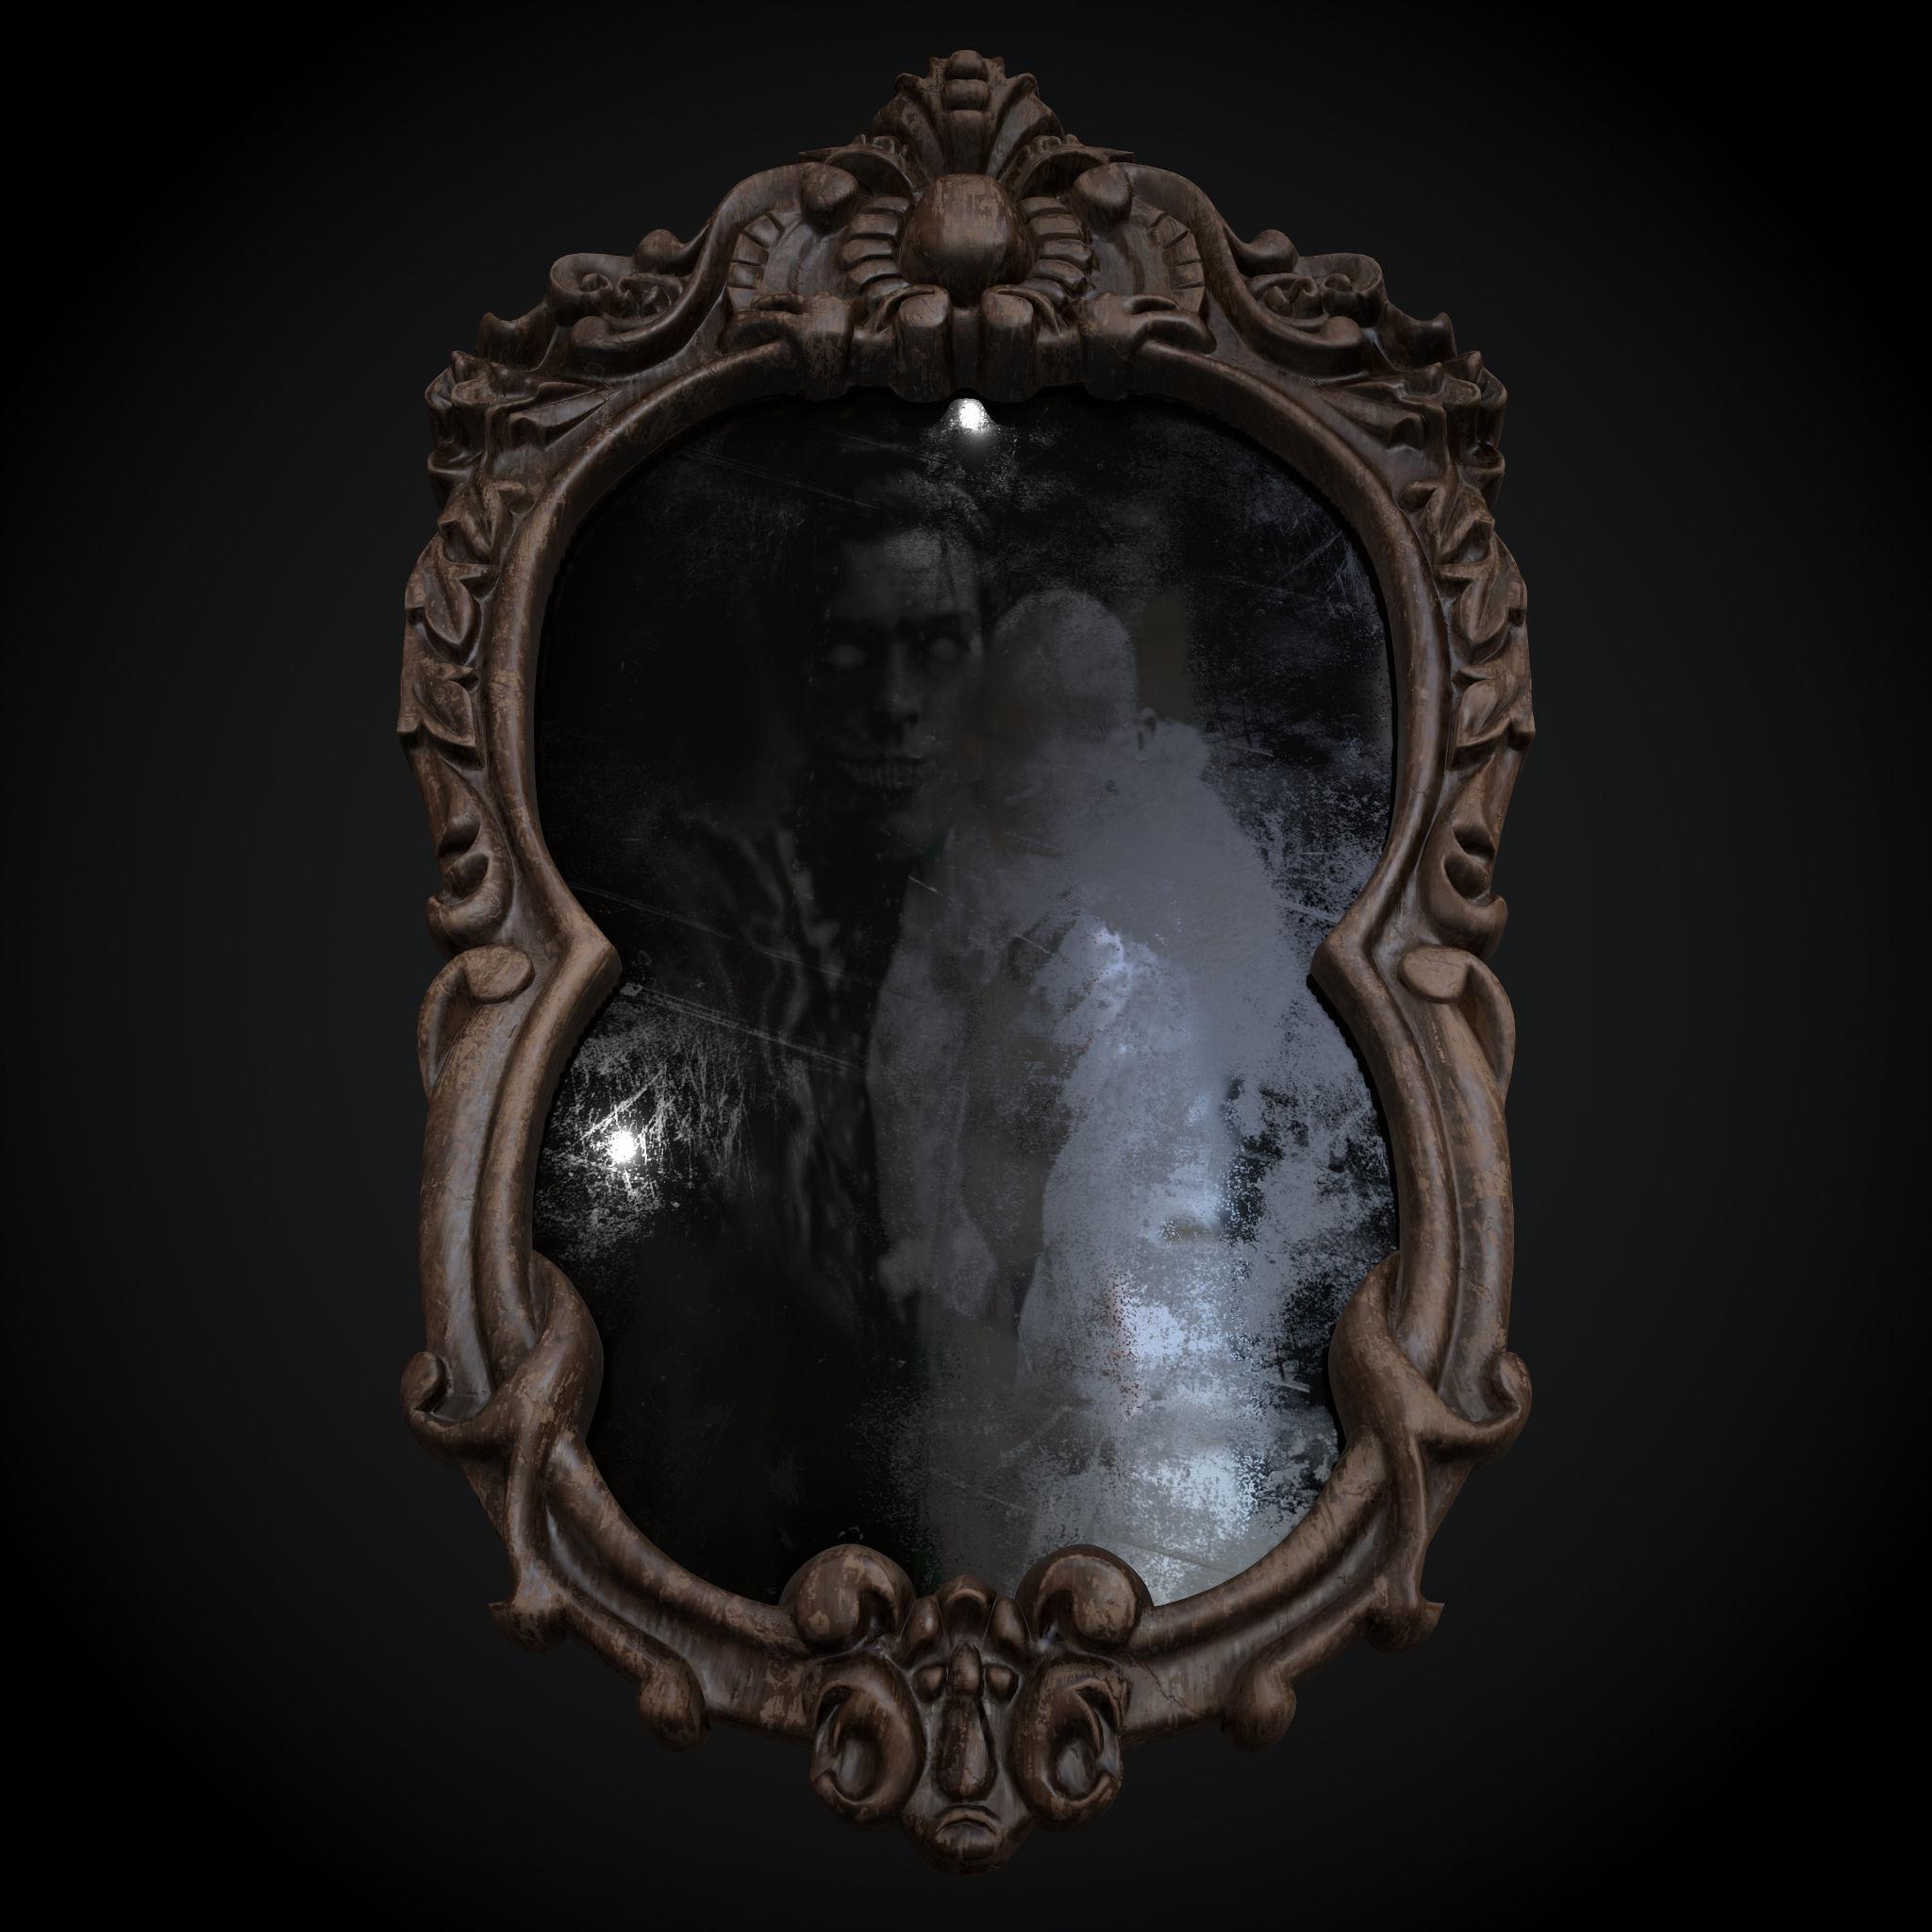 Creepy Black Mirror